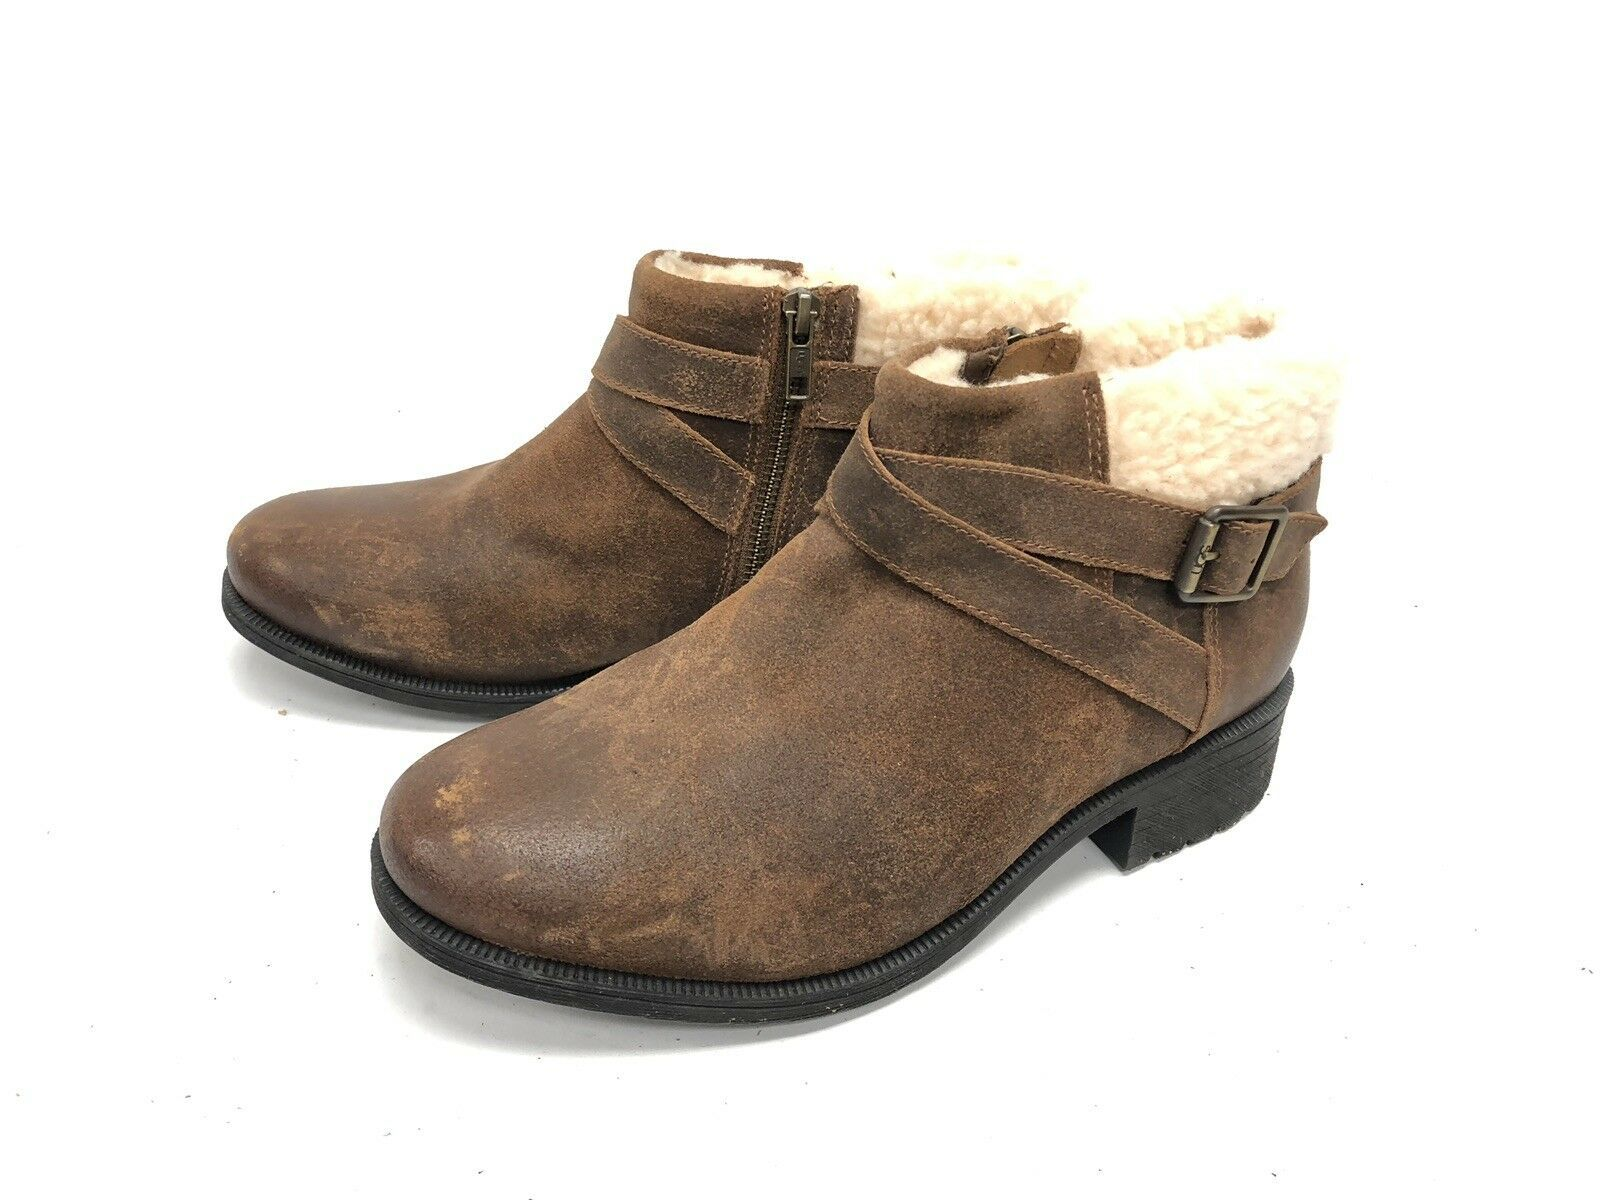 UGG Australia BENSON Buckle Sheepskin Ankle Booties 1095151 Chipmunk Waterproof image 8